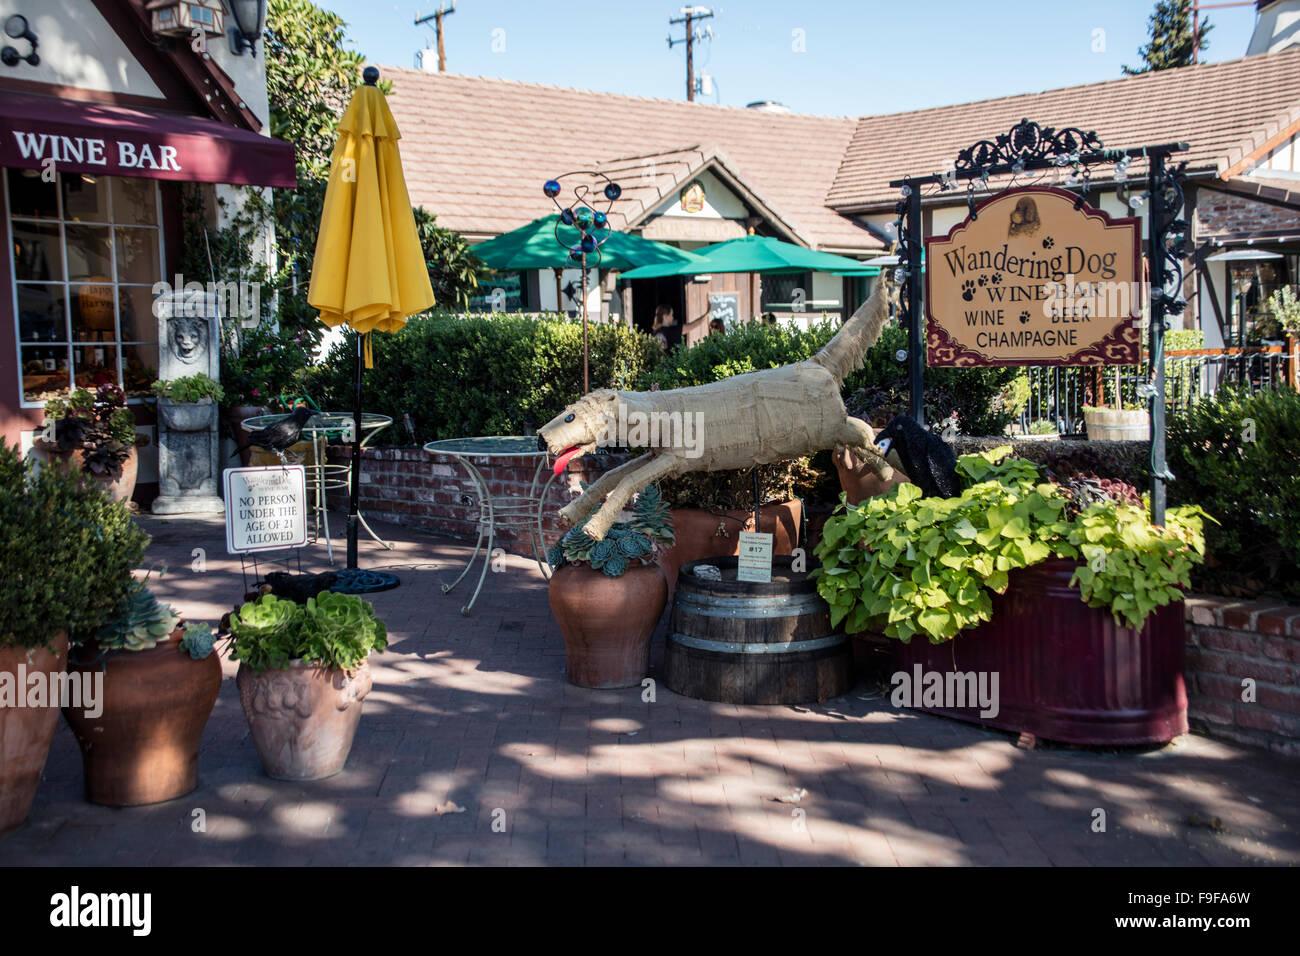 Wandering Dog Wine Bar, Mission Drive, Solvang, Ynez Valley, Santa Barbara County, California, USA. - Stock Image